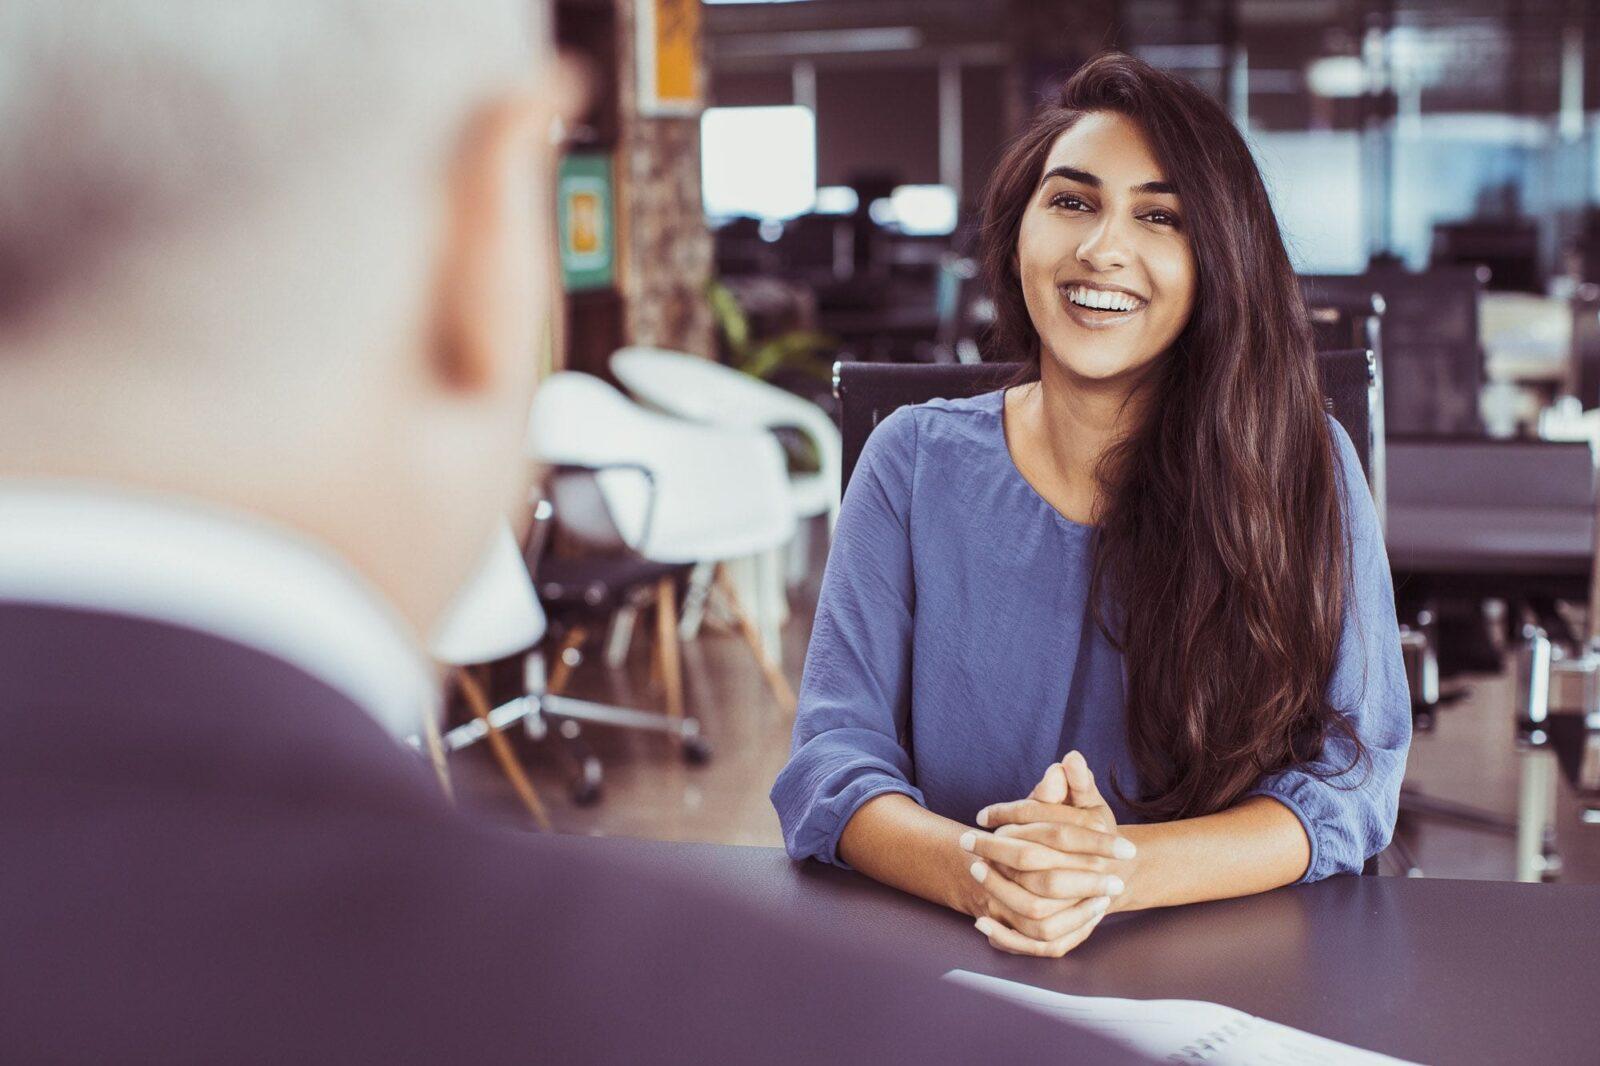 Unconscious bias when hiring